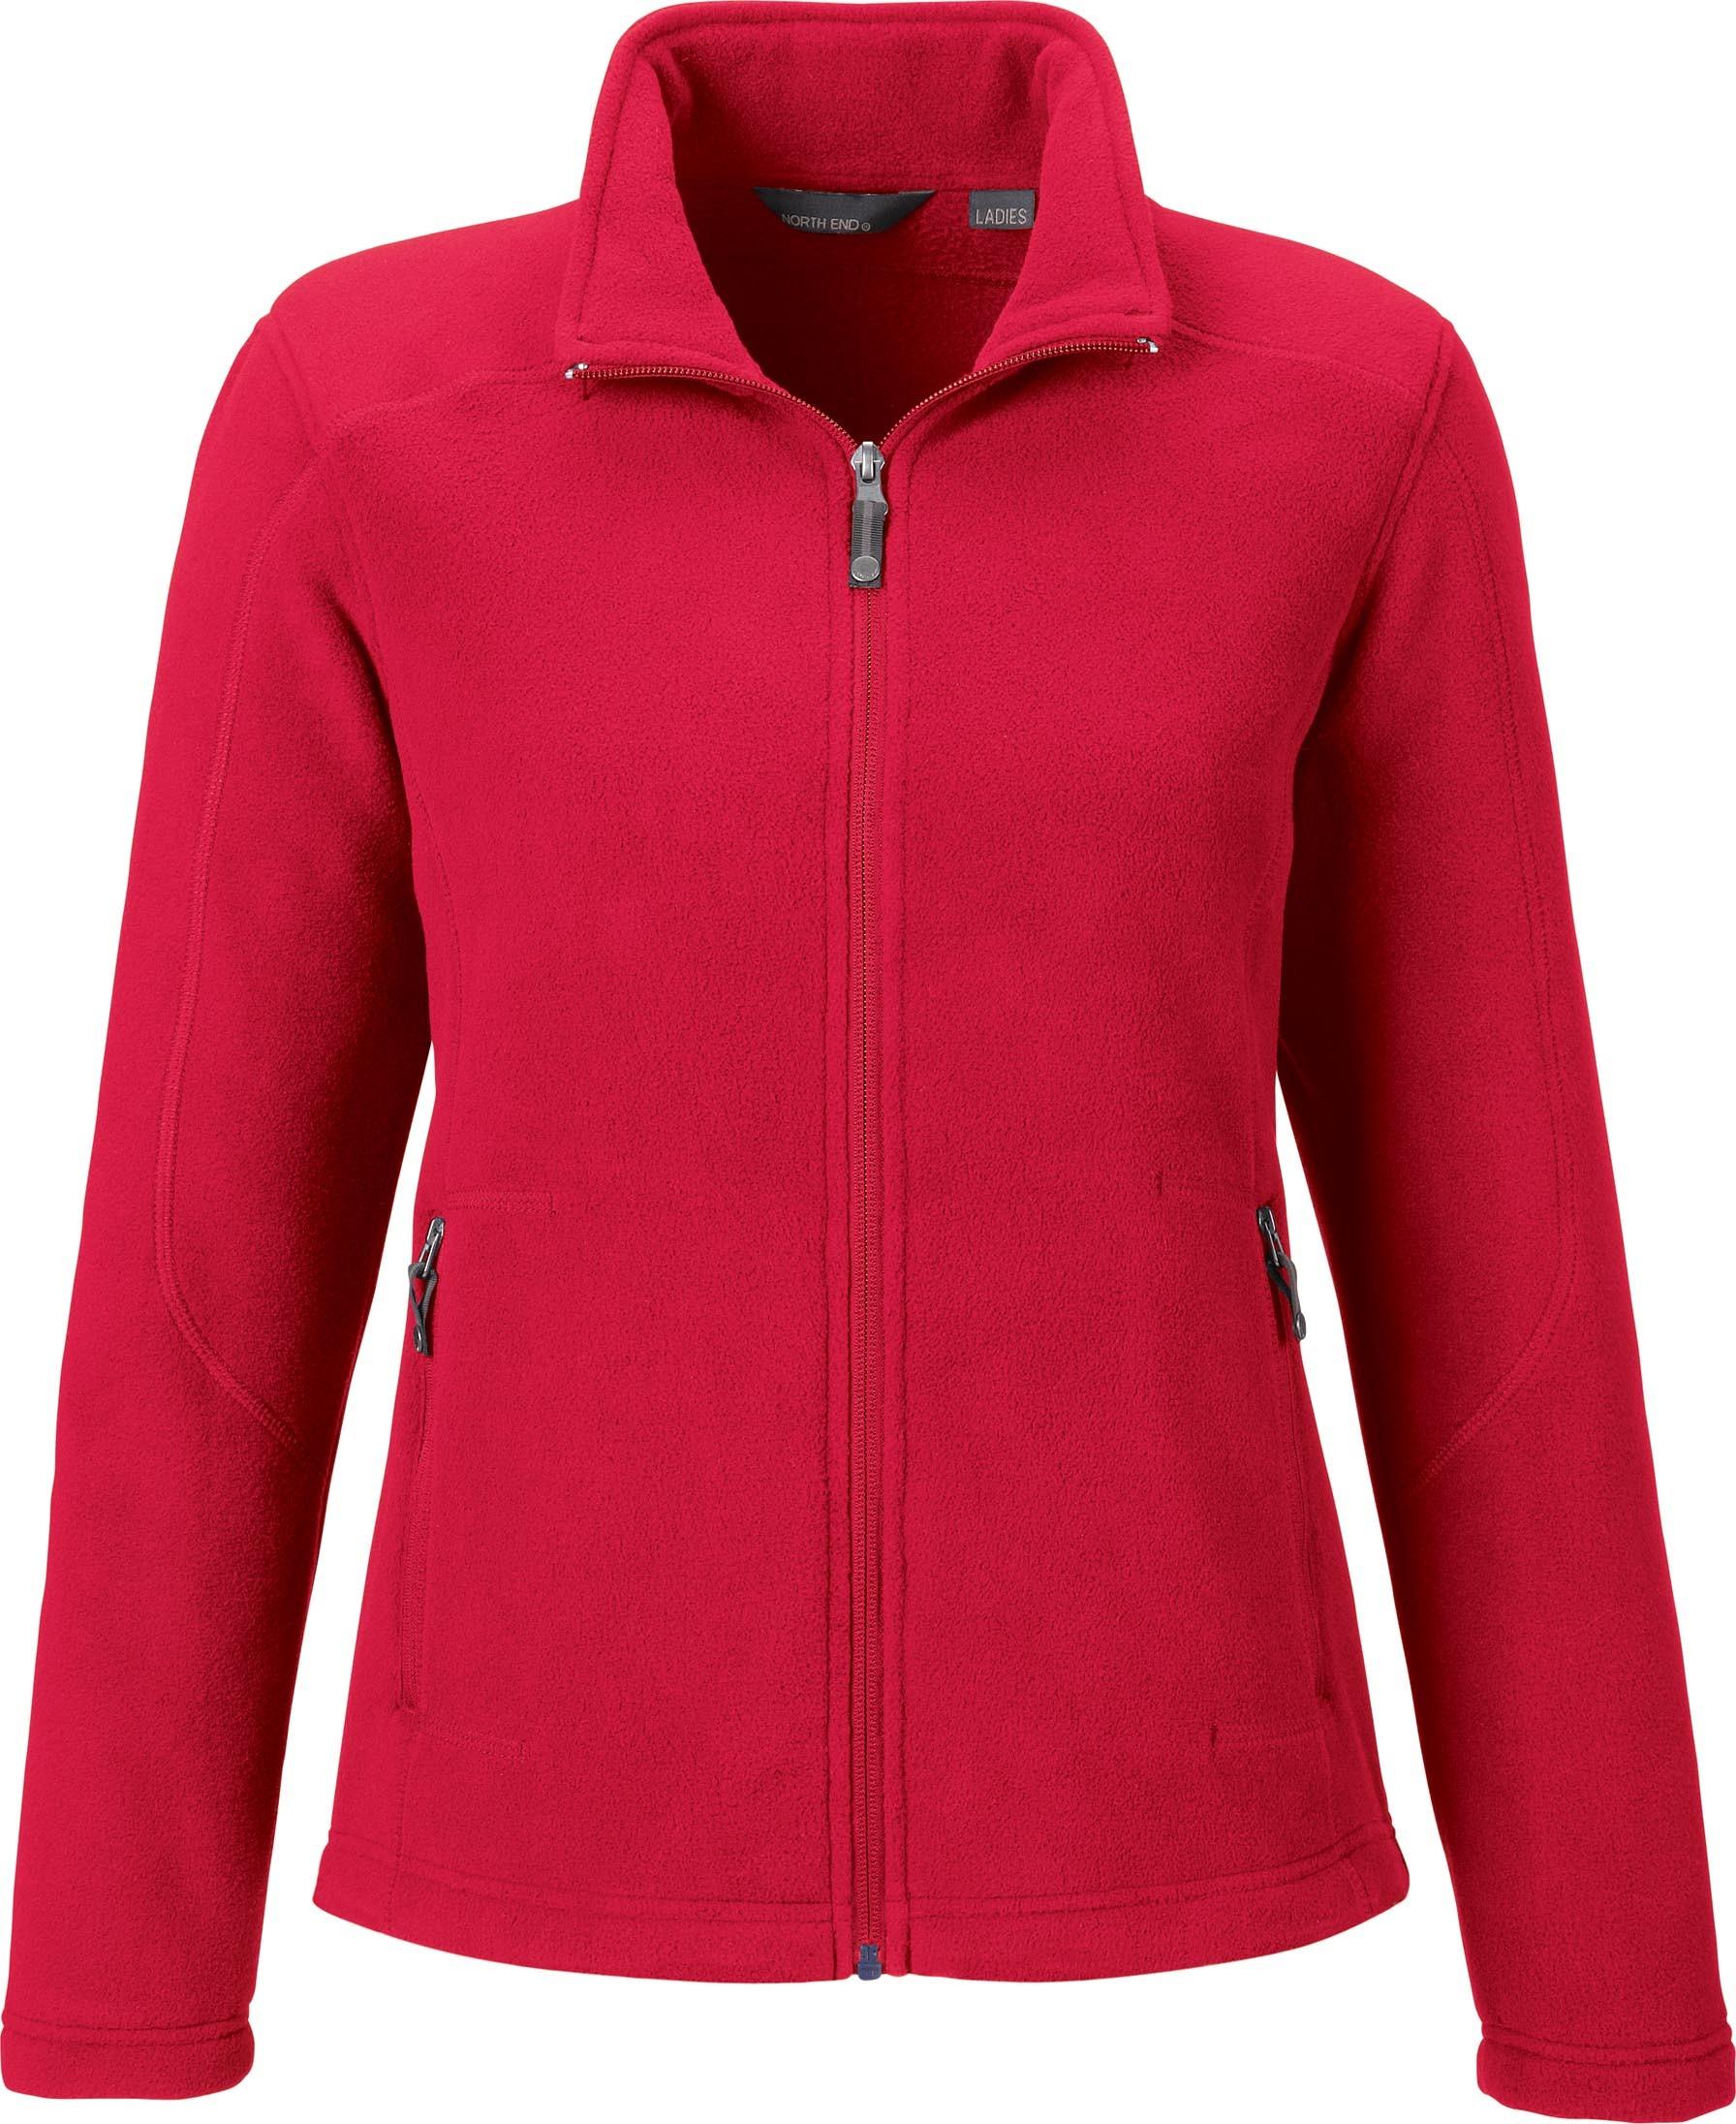 Ash City Poly Fleece 78172 - Voyage Ladies' Fleece Jacket